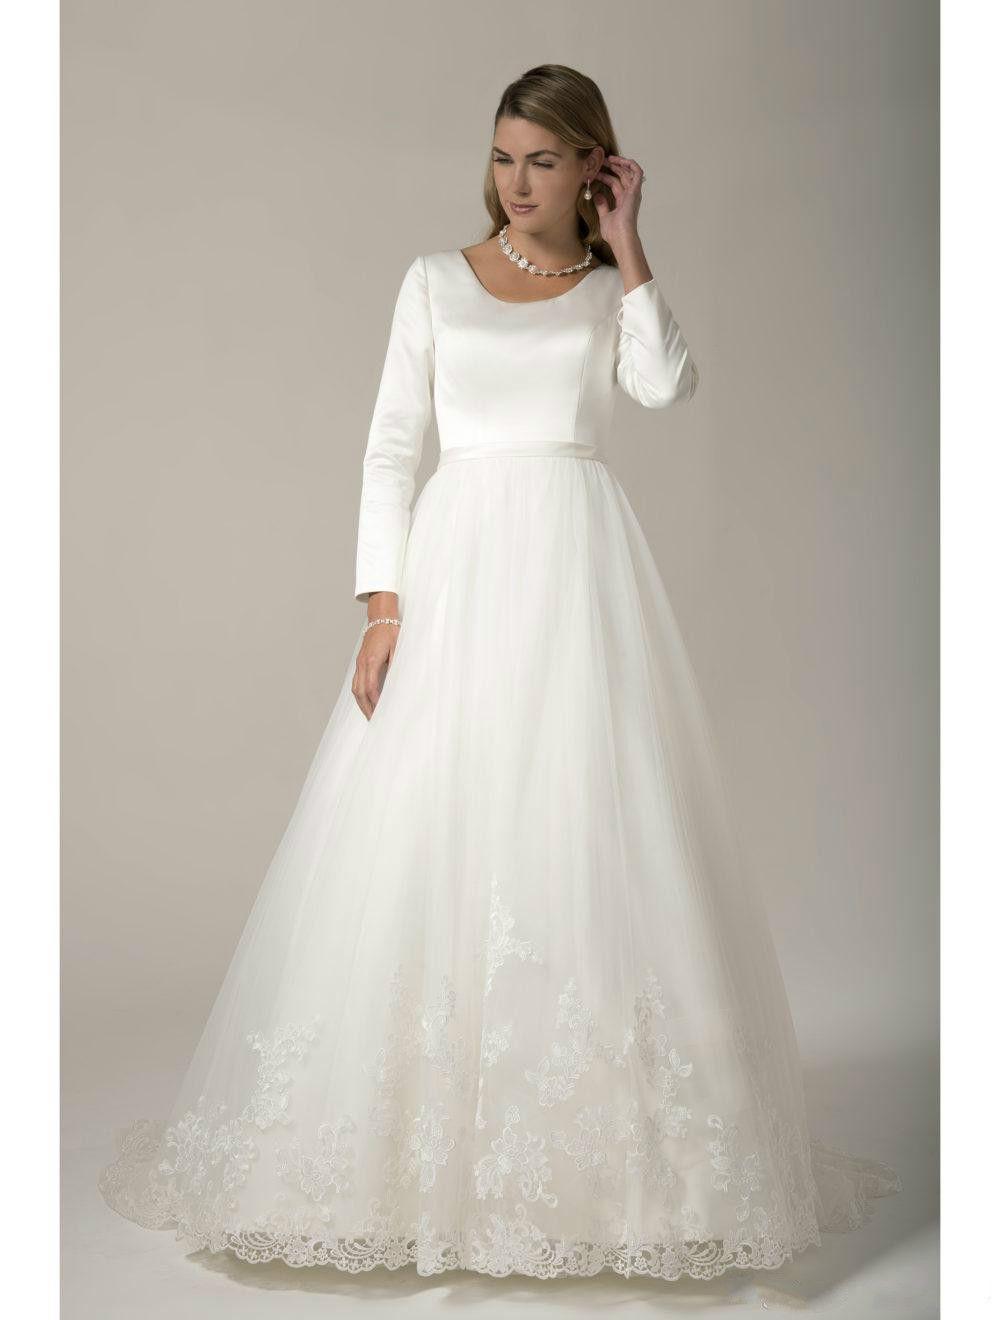 Discount Vintage White Satin Long Sleeve Wedding Dresses